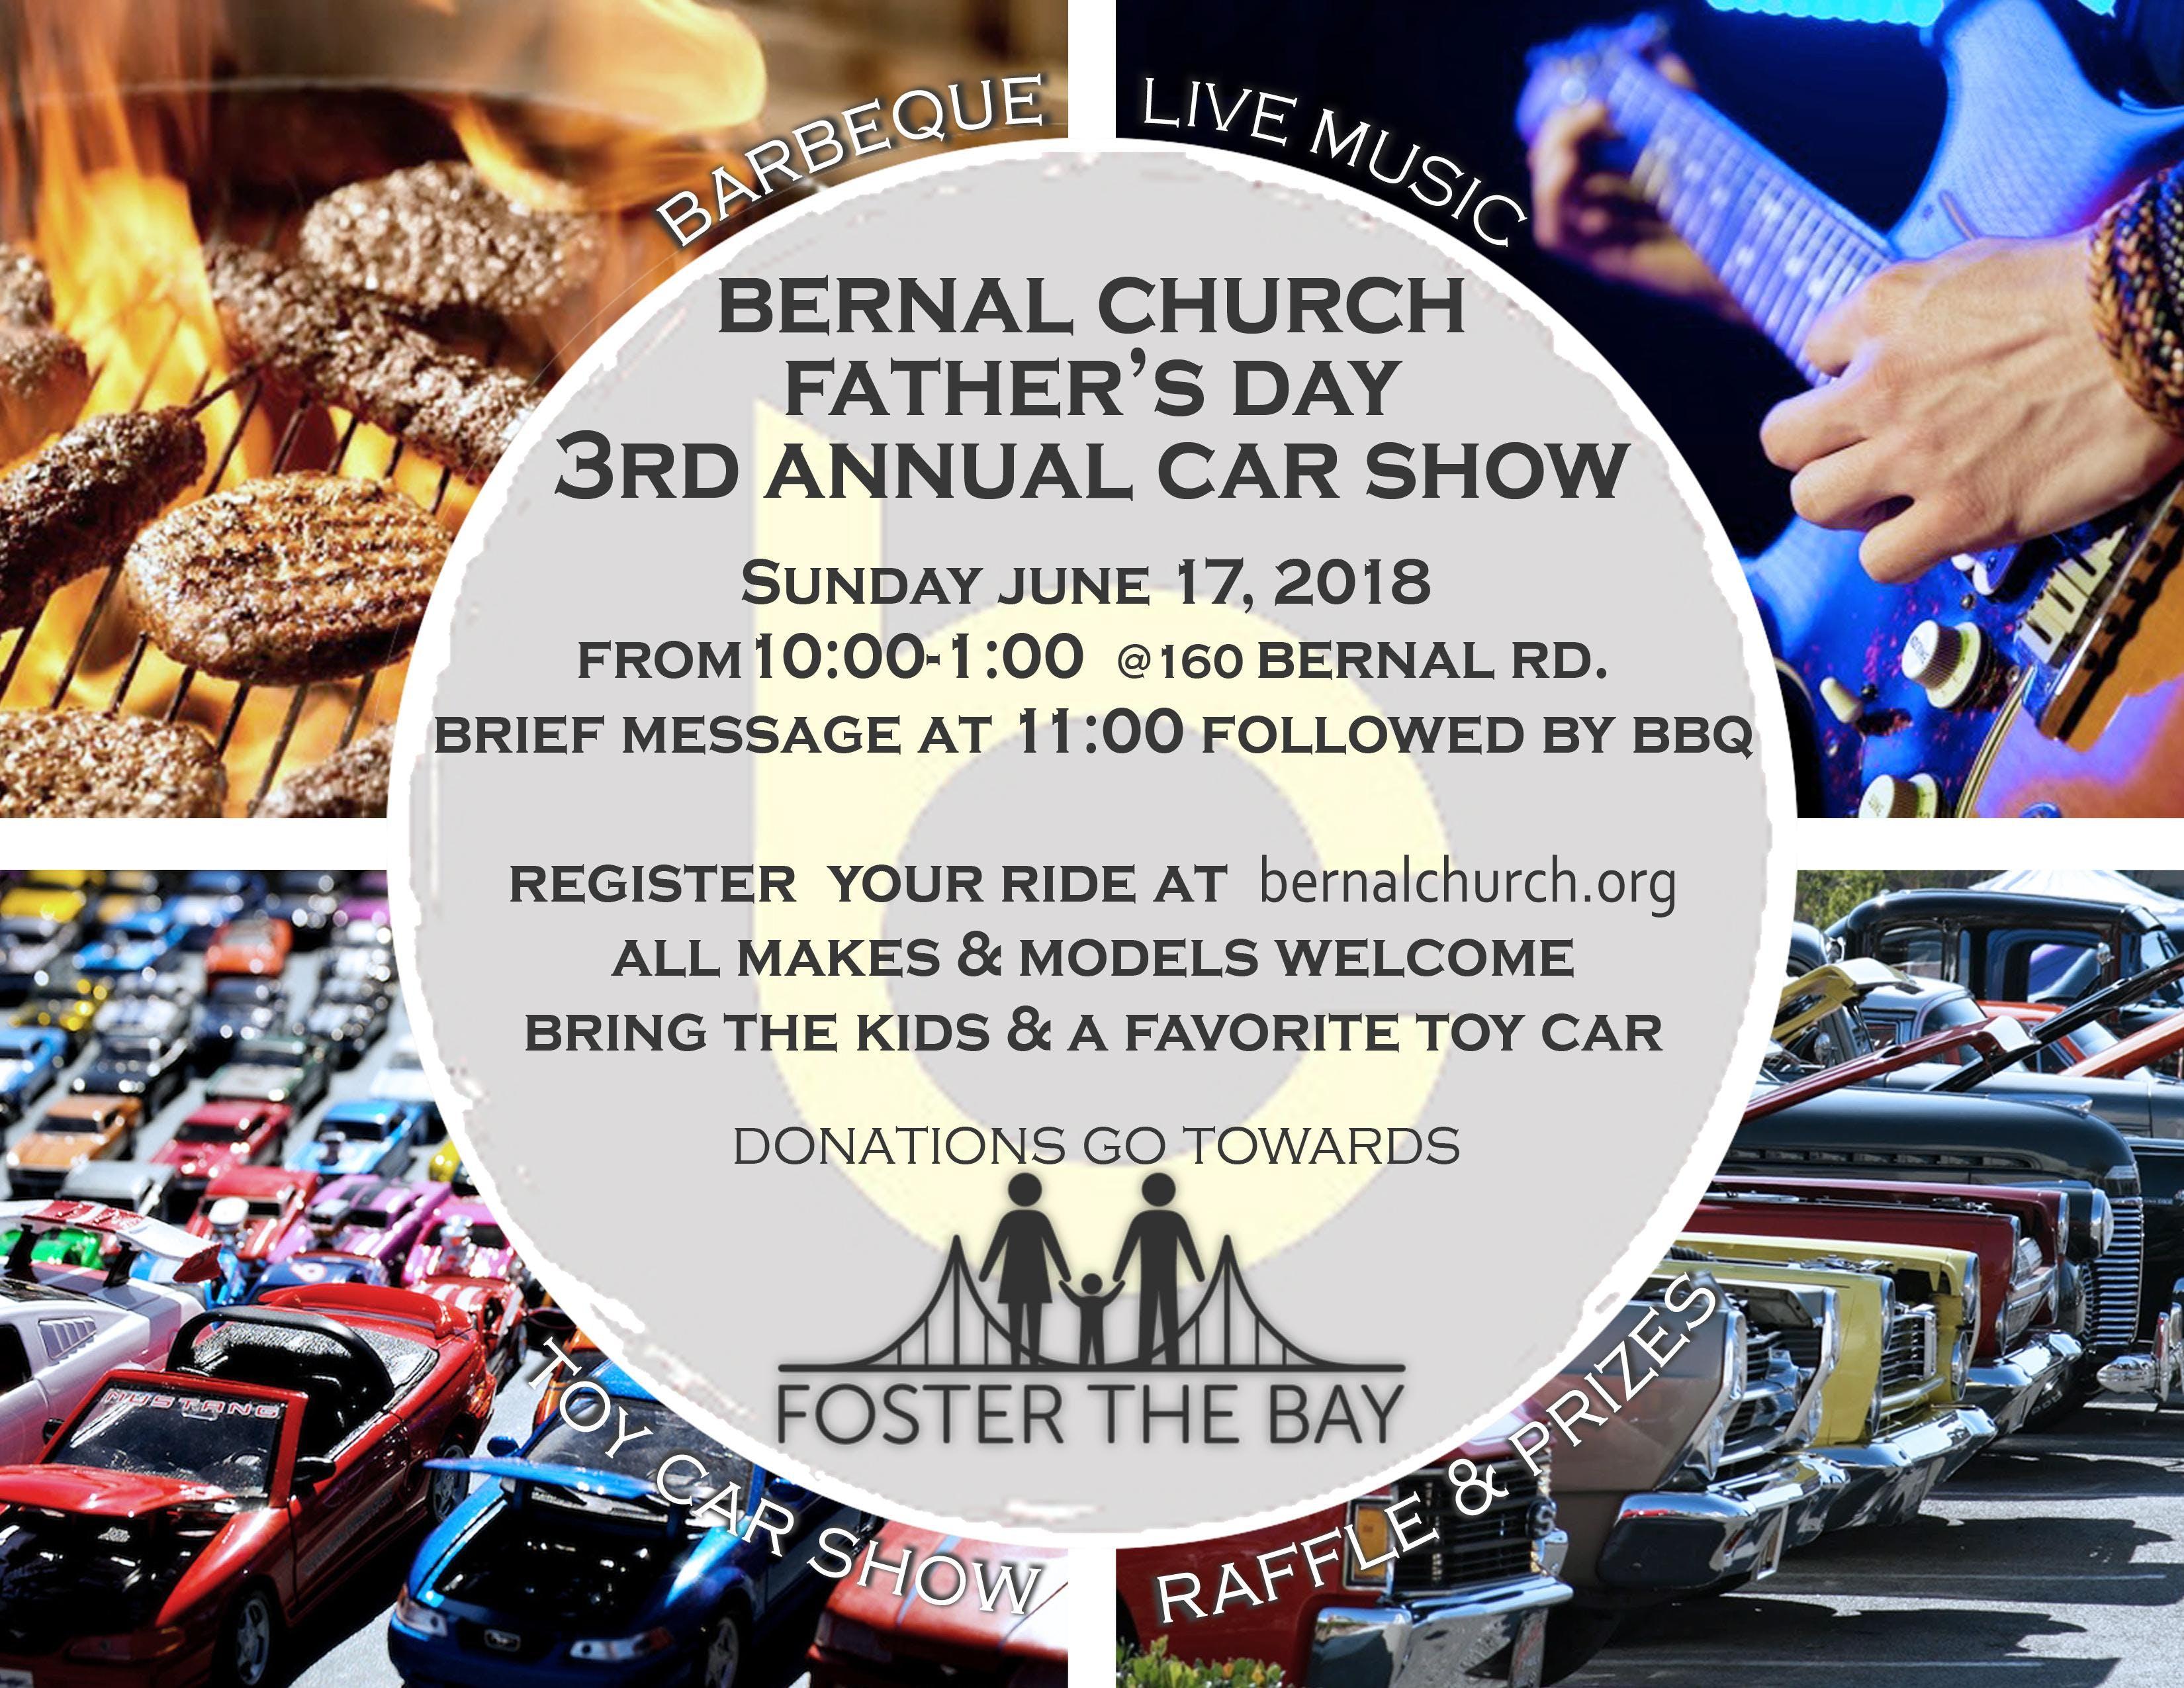 Fathers Day Car Show For Foster The Bay At Bernal Church San Jose - San jose car show 2018